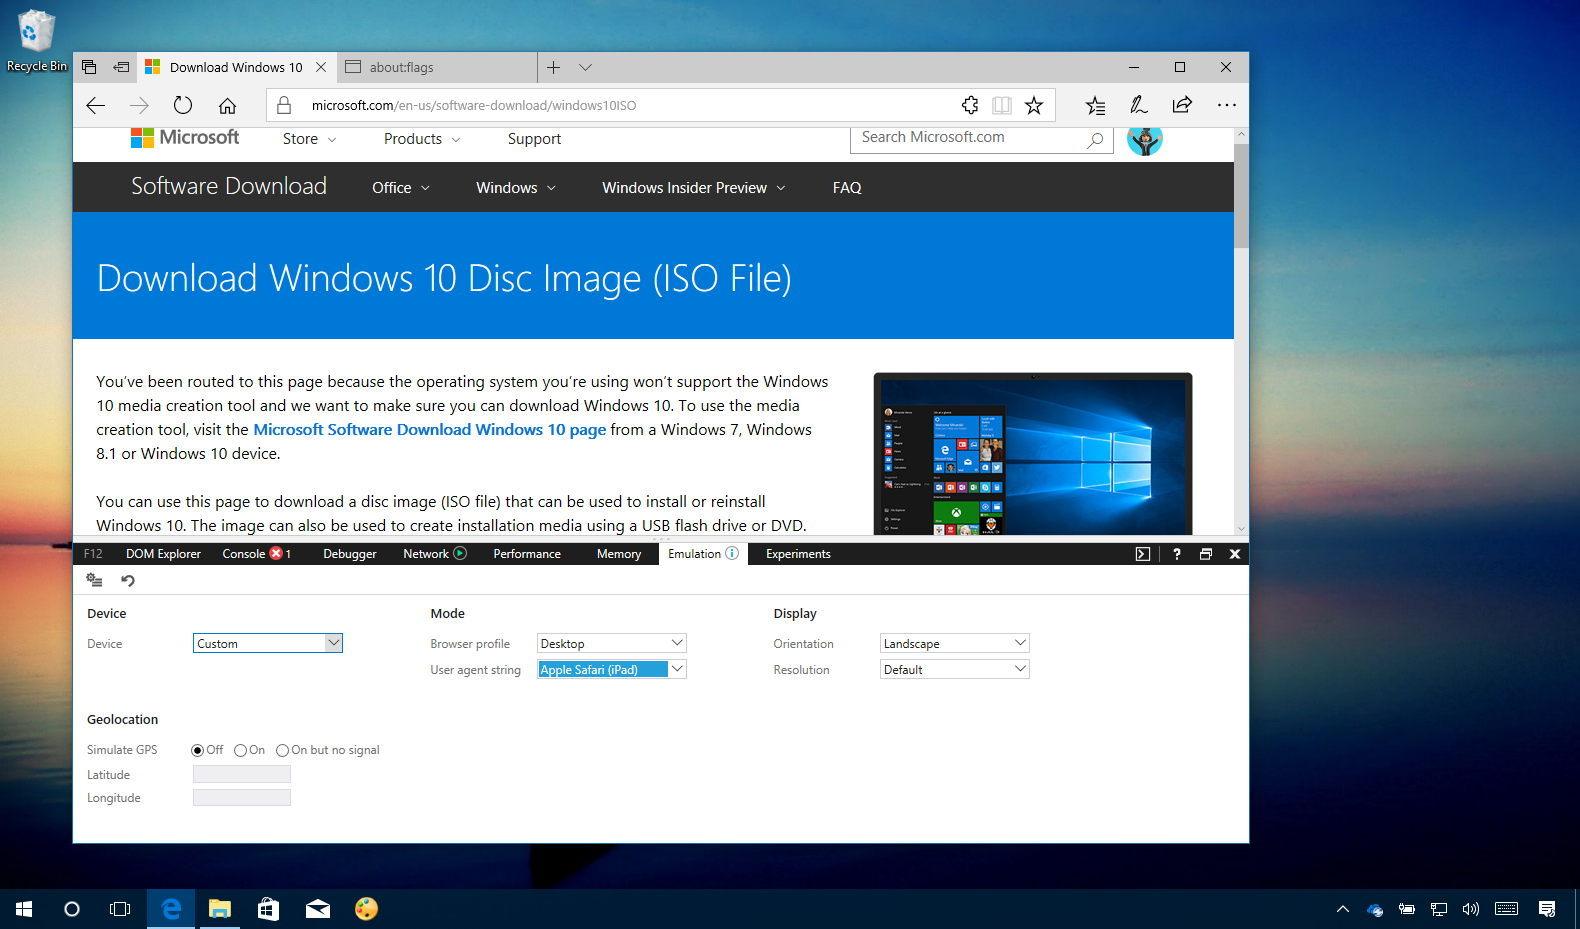 Download Windows 10 Fall Creators Update ISO file